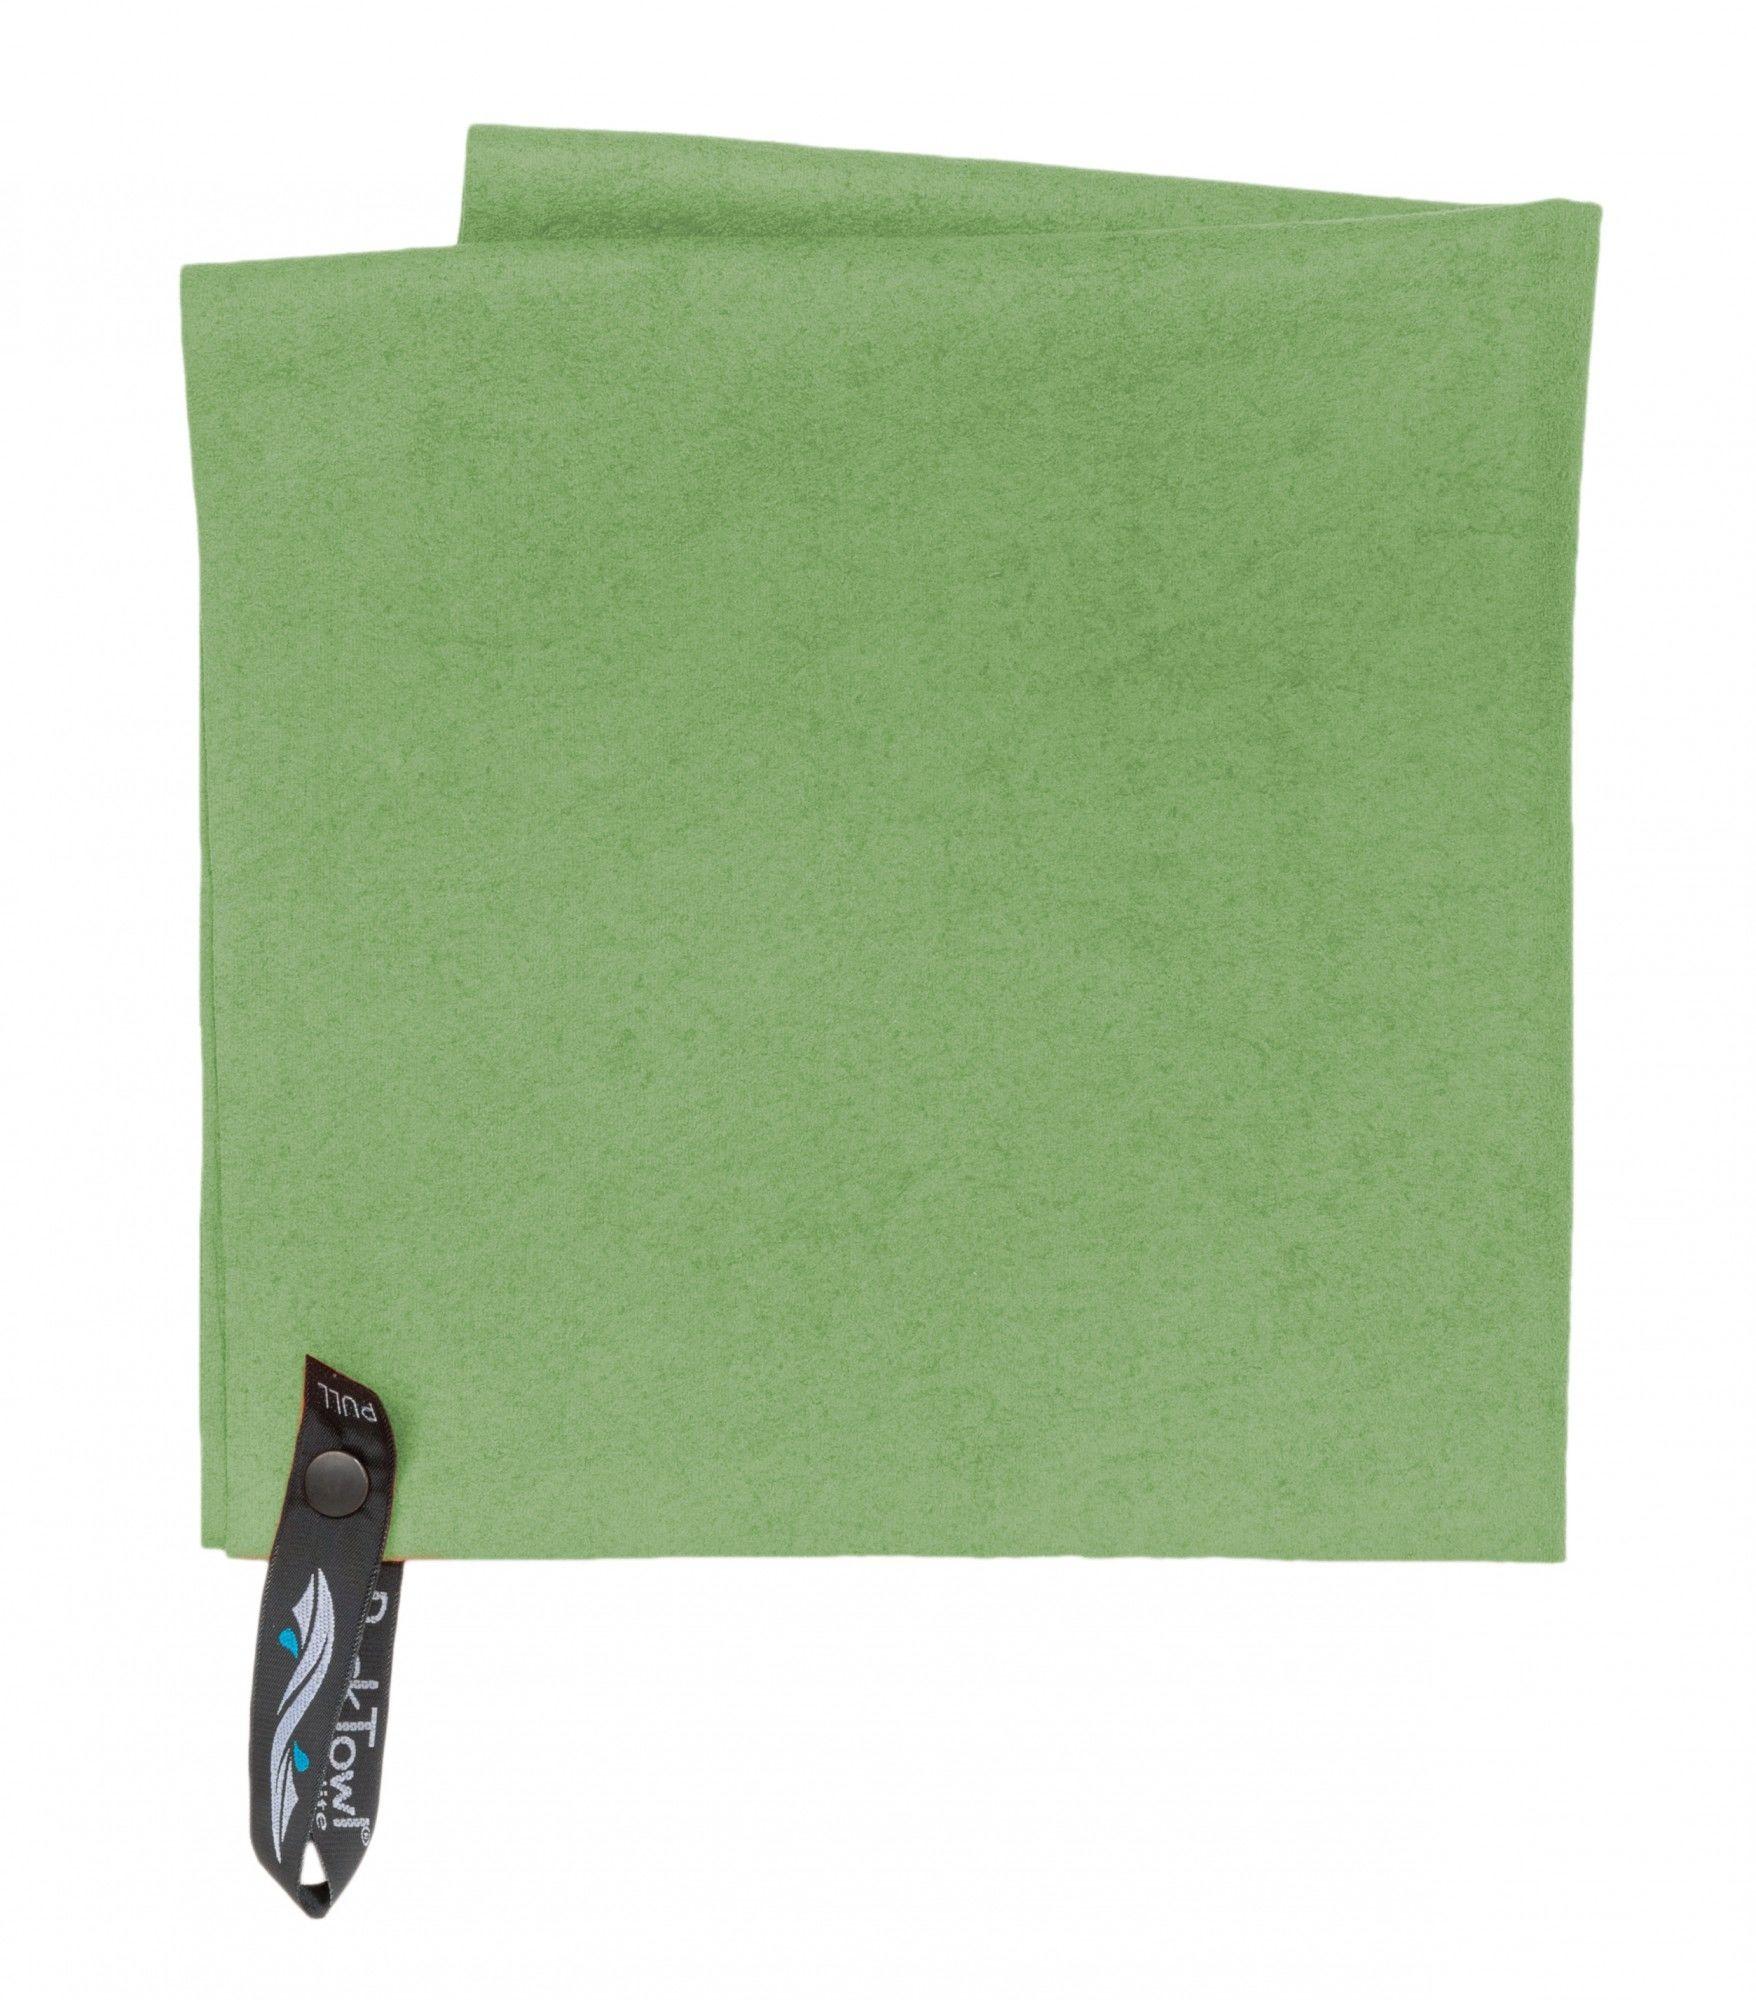 PackTowl Ultralite L-Hand Grün, Outdoor-Hygiene, One Size